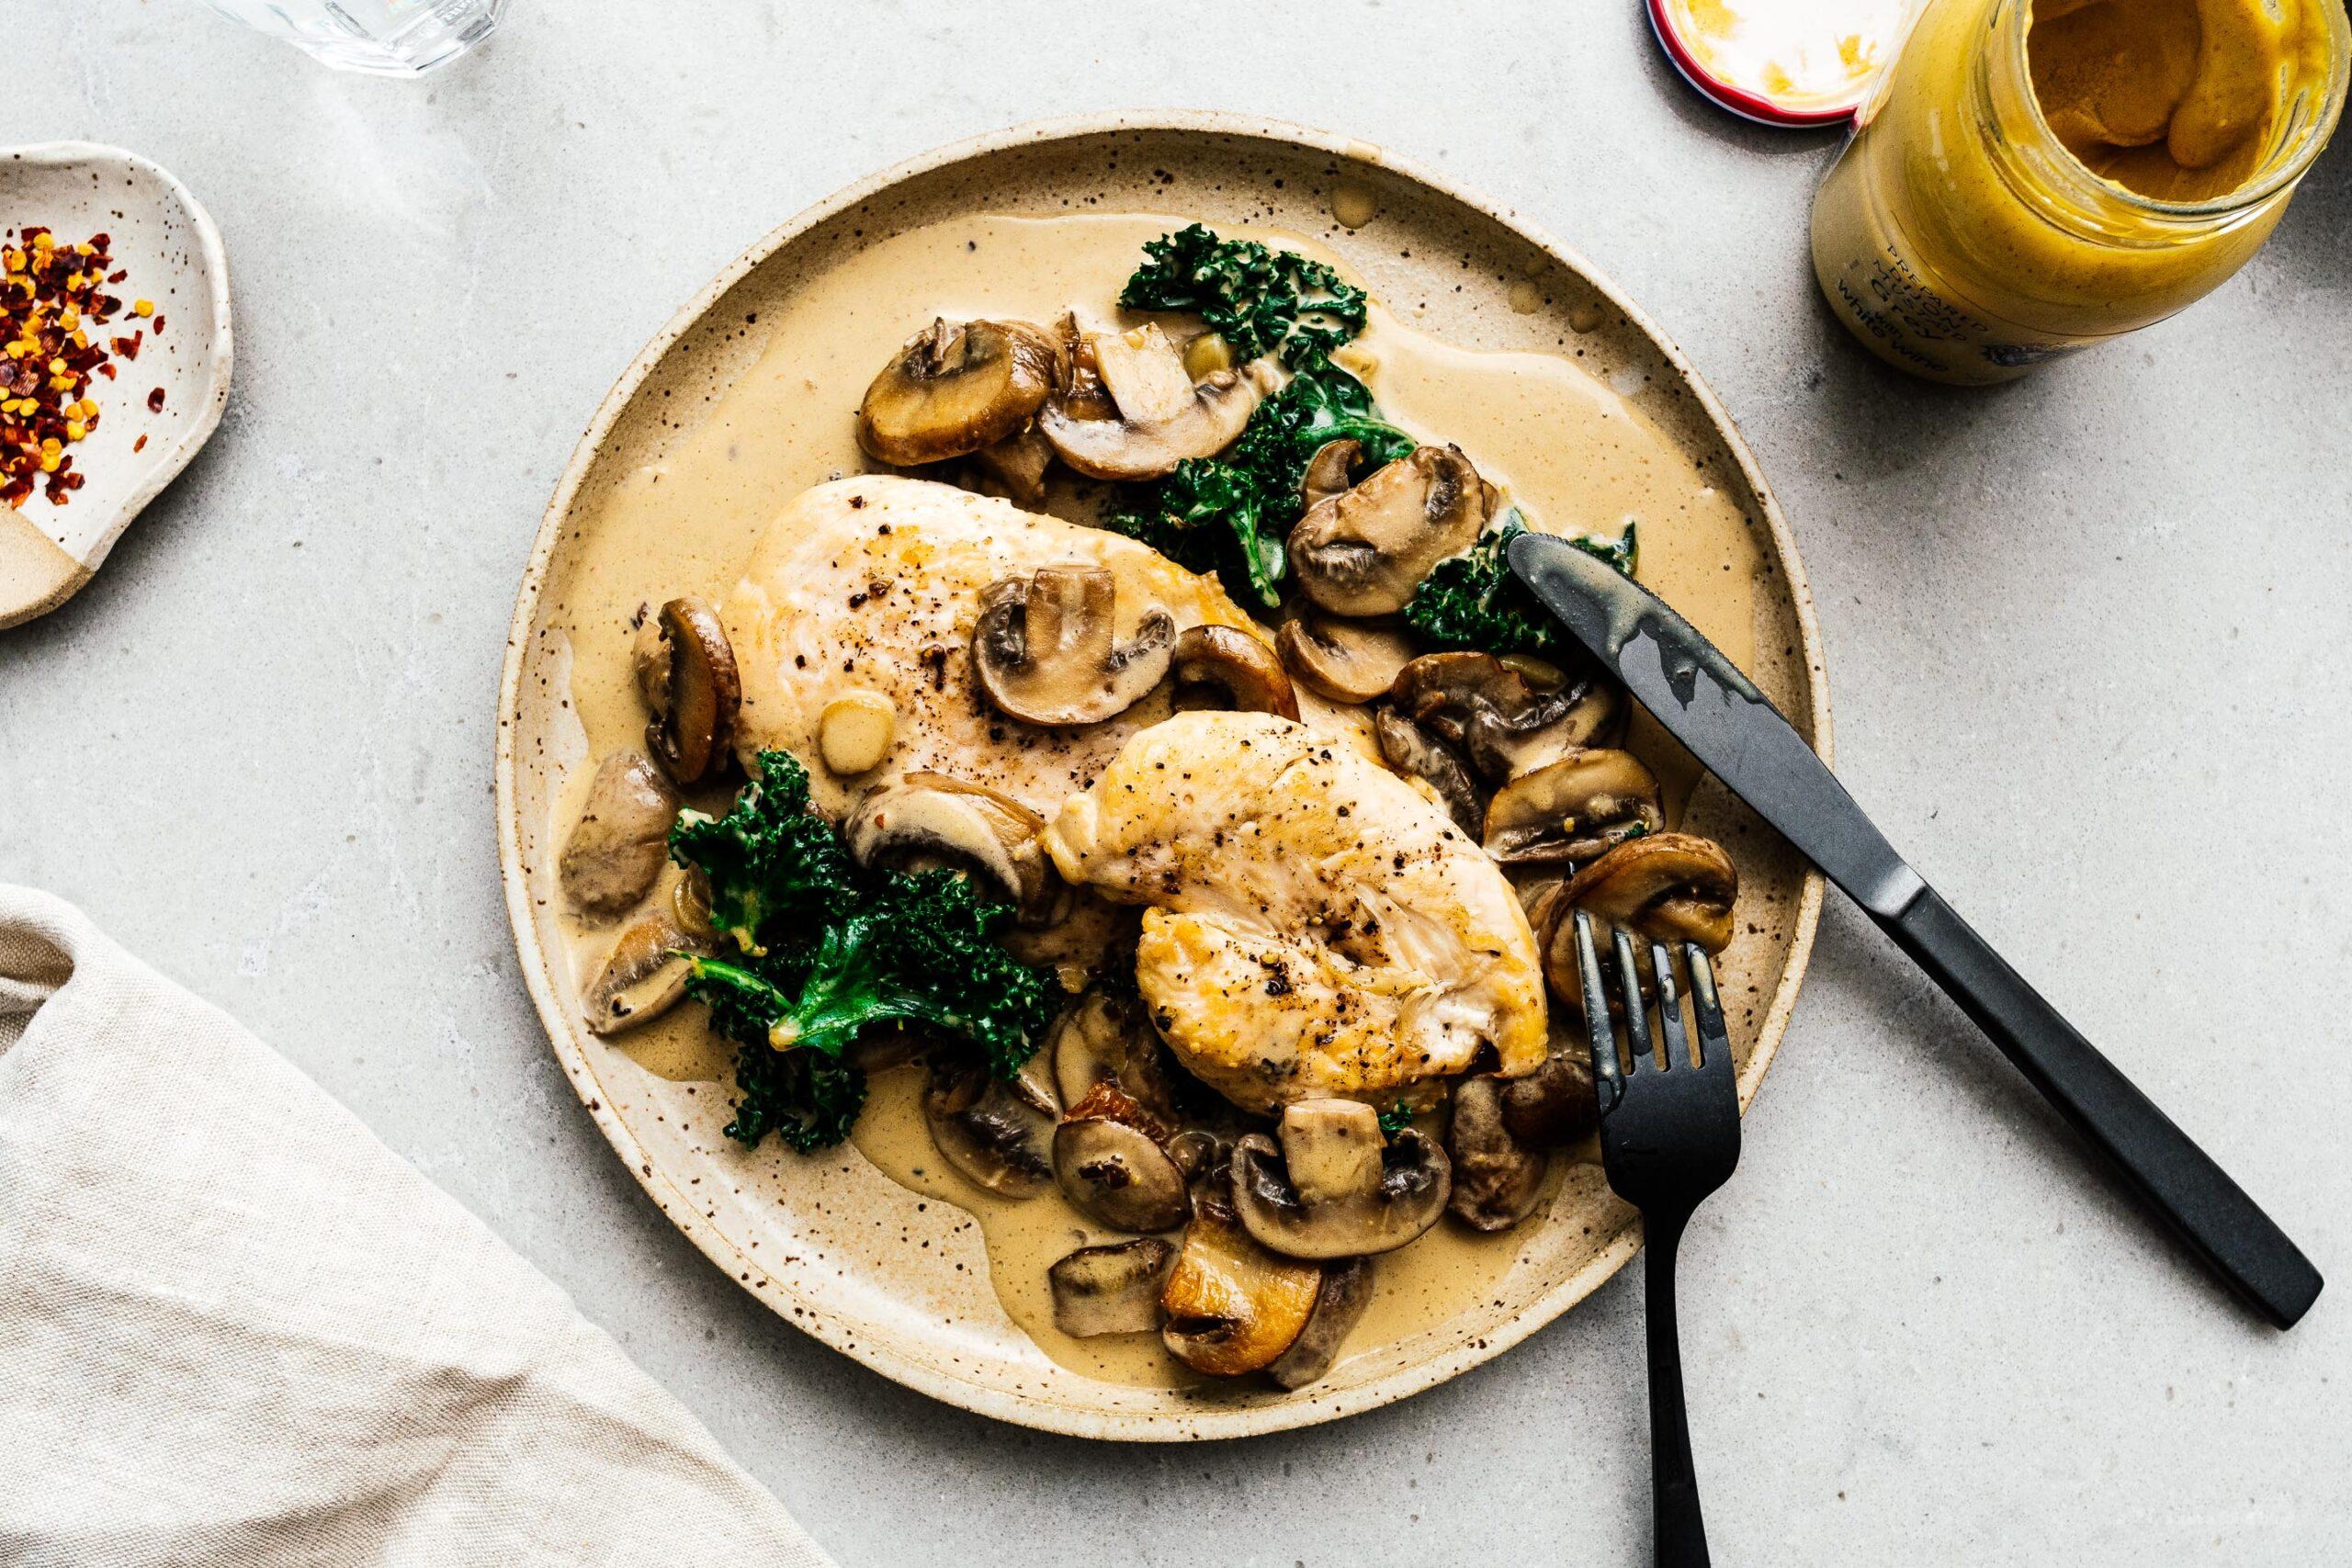 One Pan Creamy Dijon Mustard Mushroom Chicken   www.iamafoodblog.com